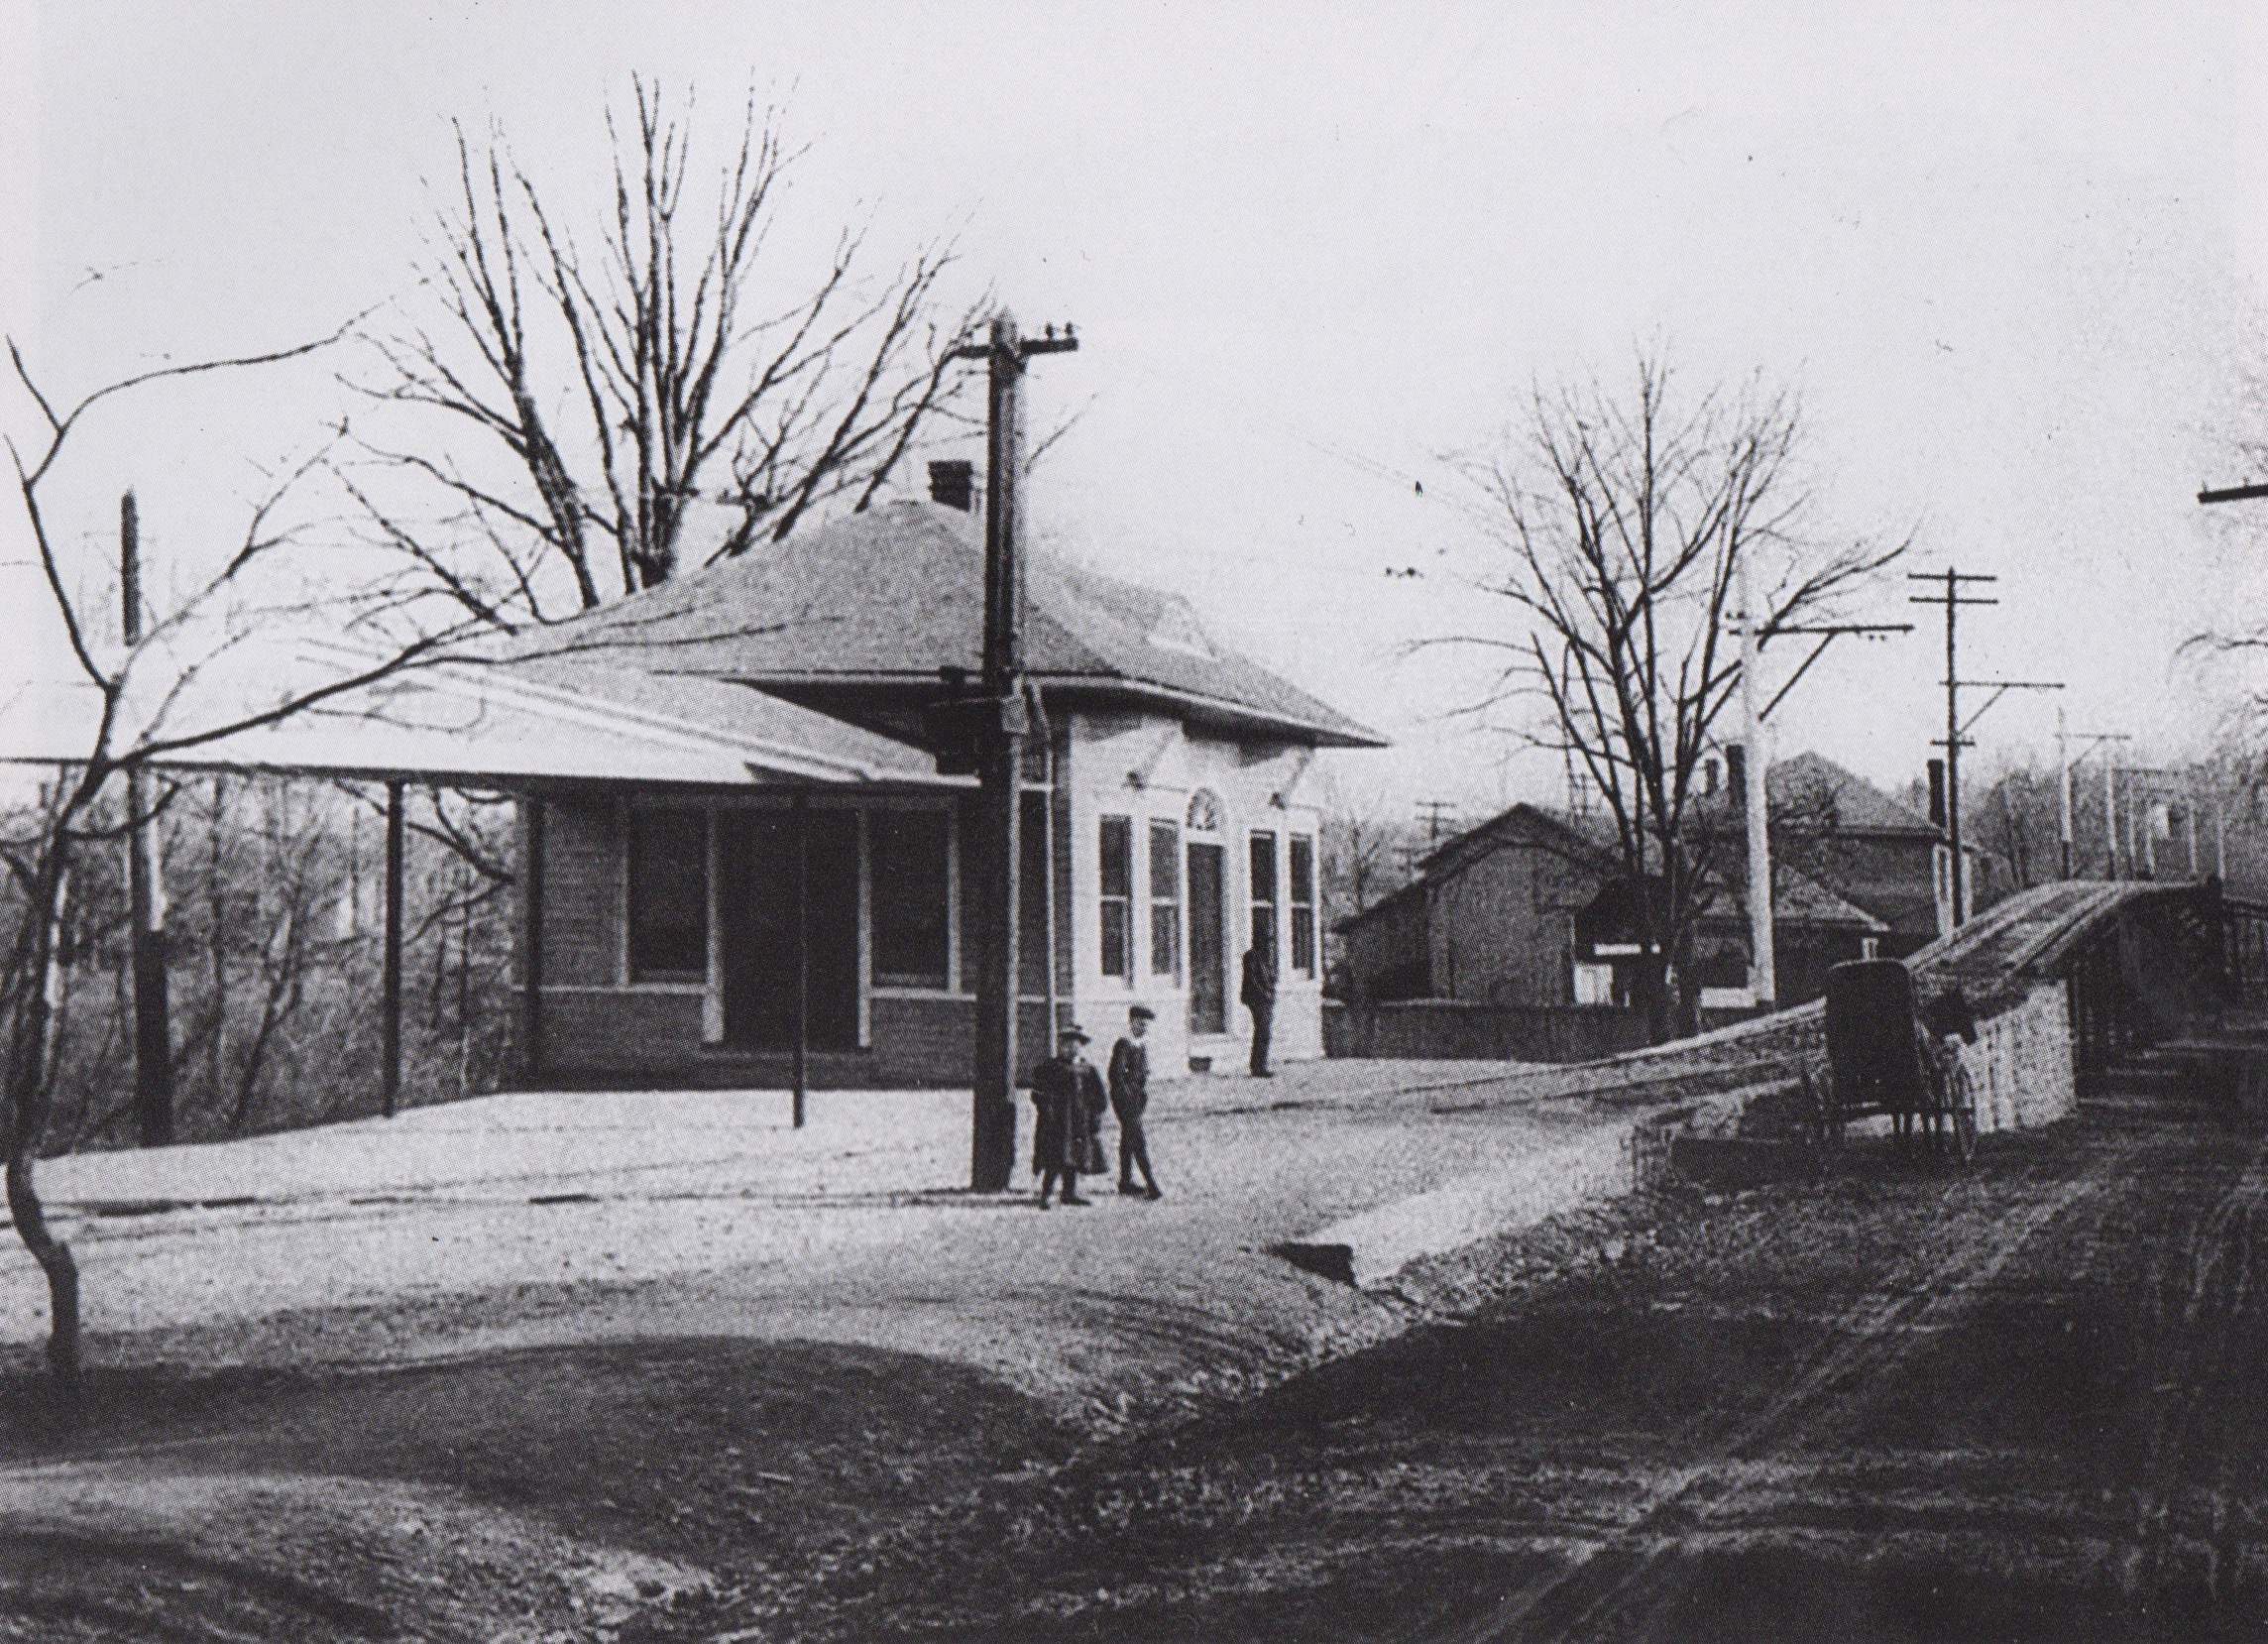 Image Credit: Mark B Miller, 1900, Sulgrave Avenue Waiting Station